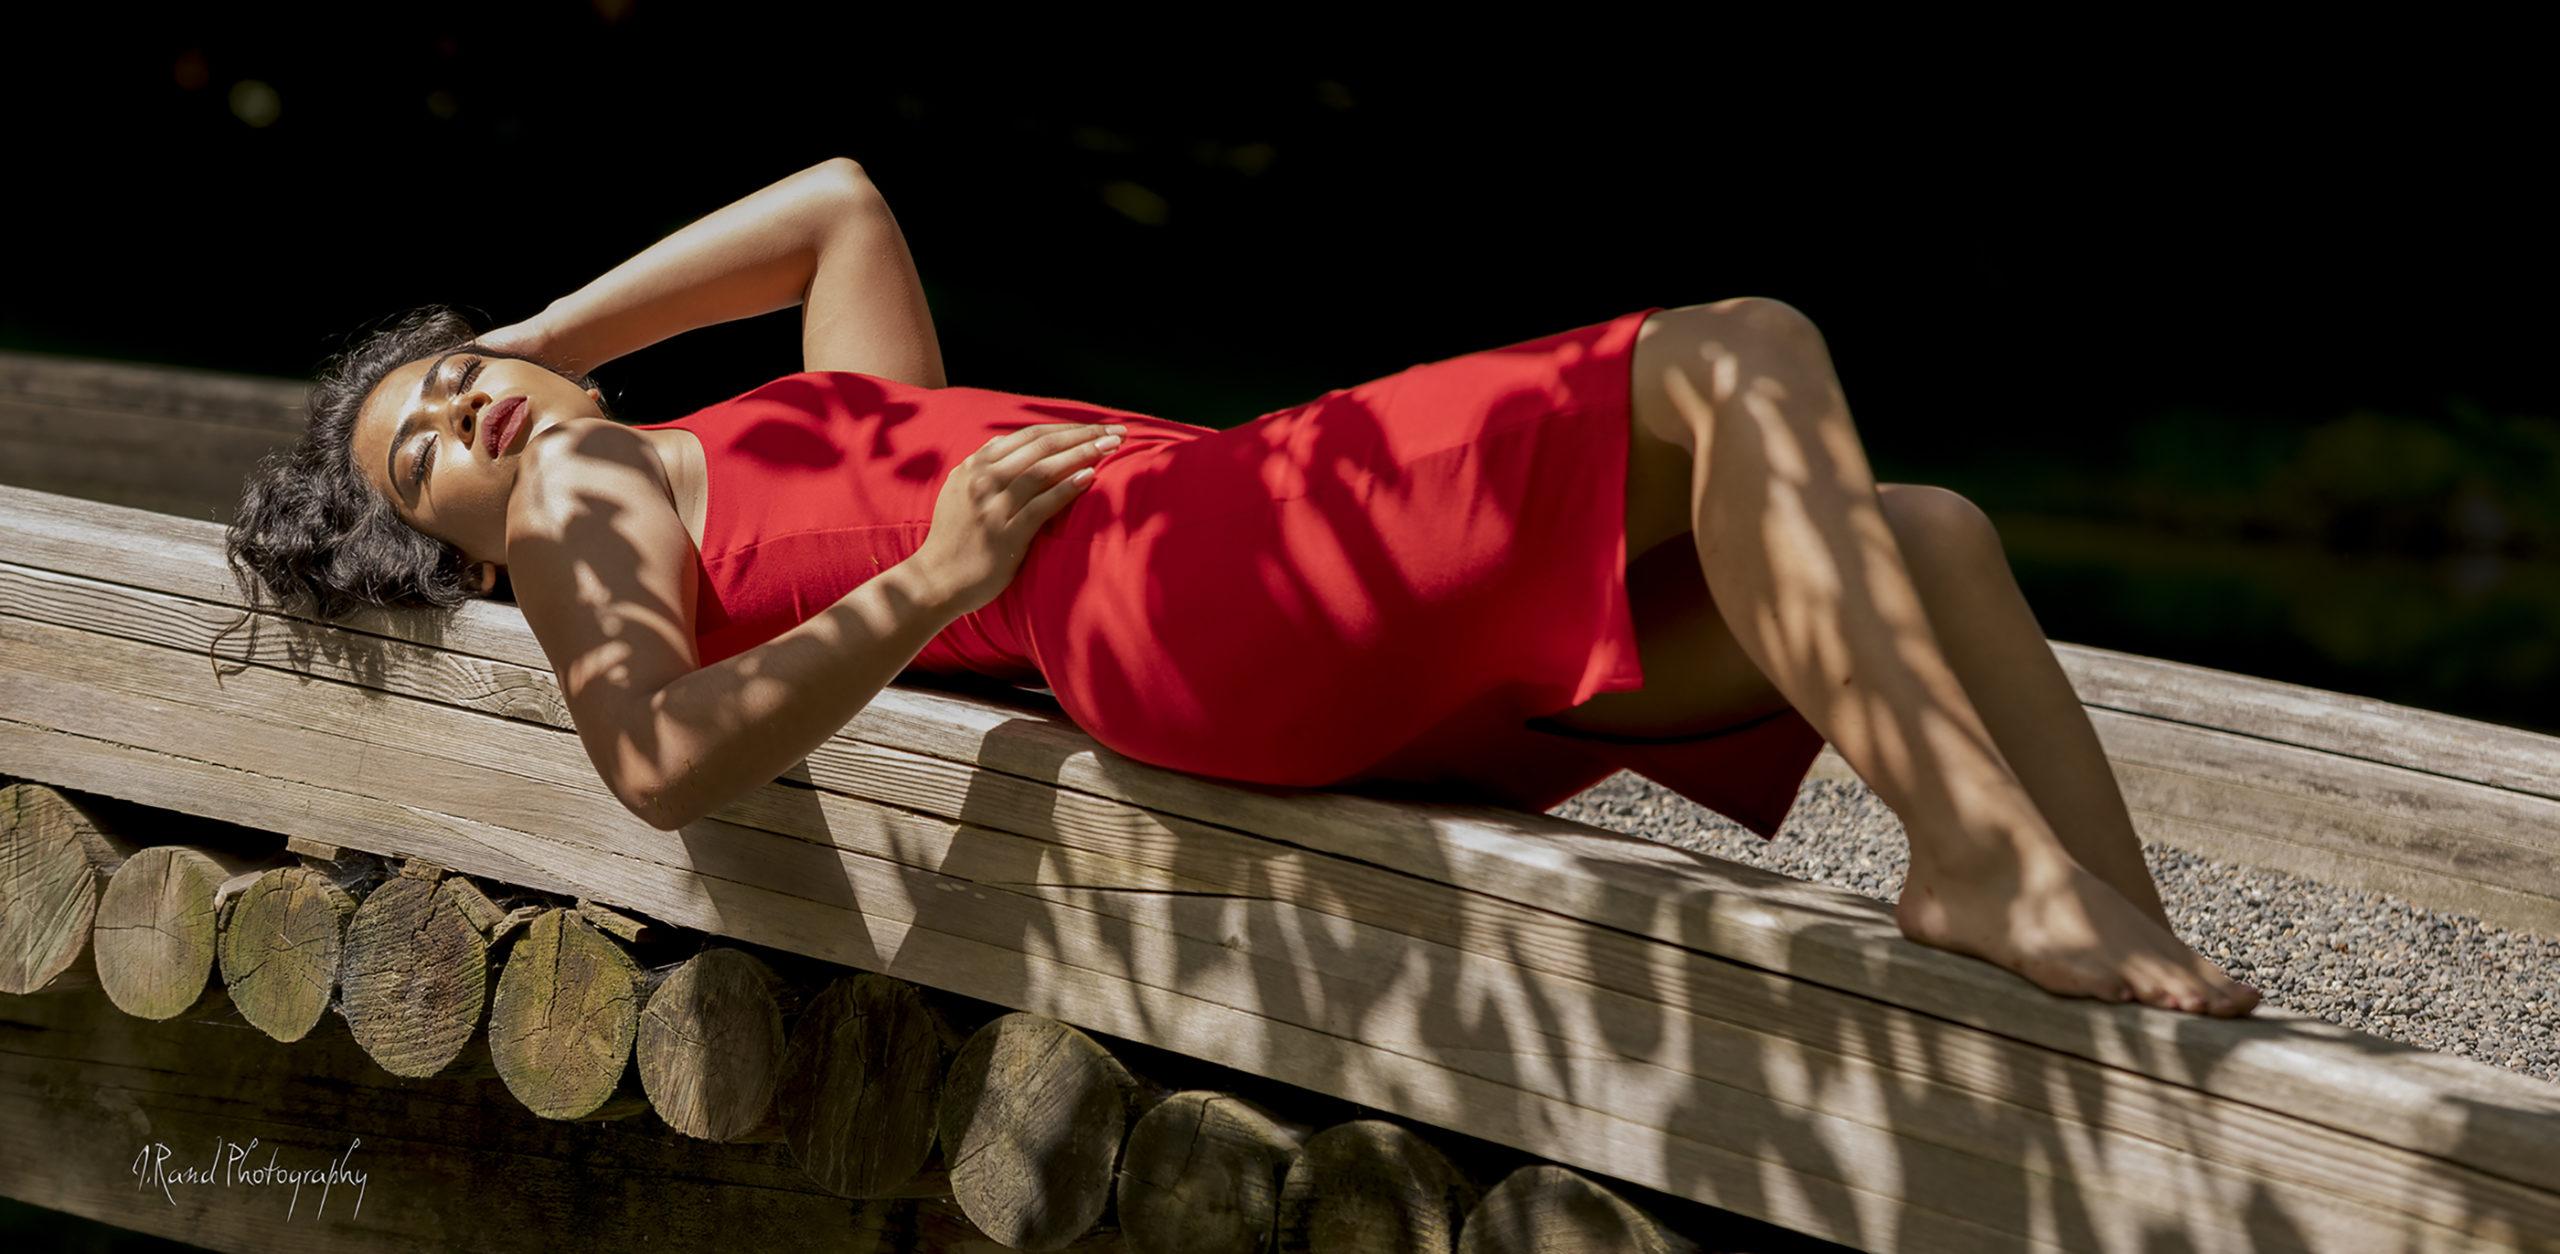 Shyinne Vancouver Model